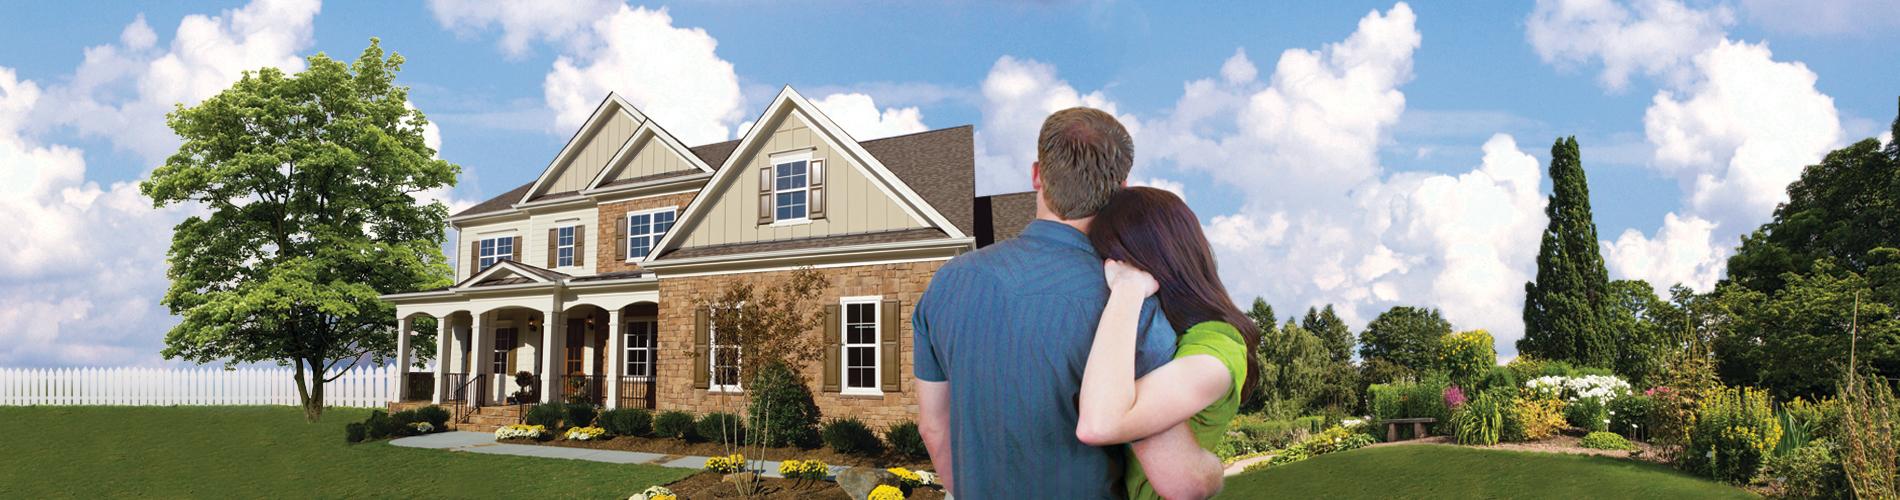 Landmark Home Warranty Reviews Texas